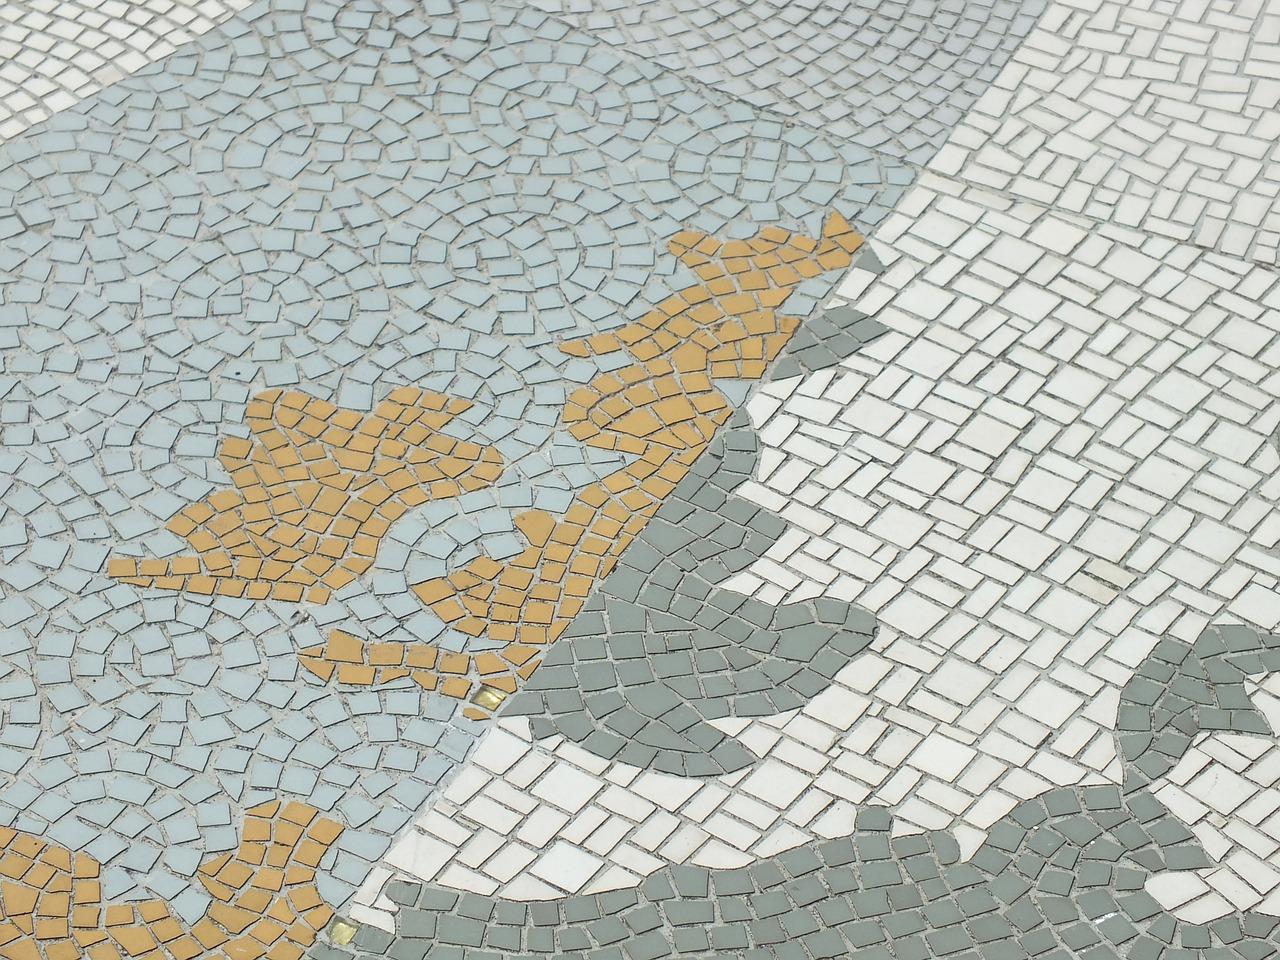 a mosaic of the United Kingdom